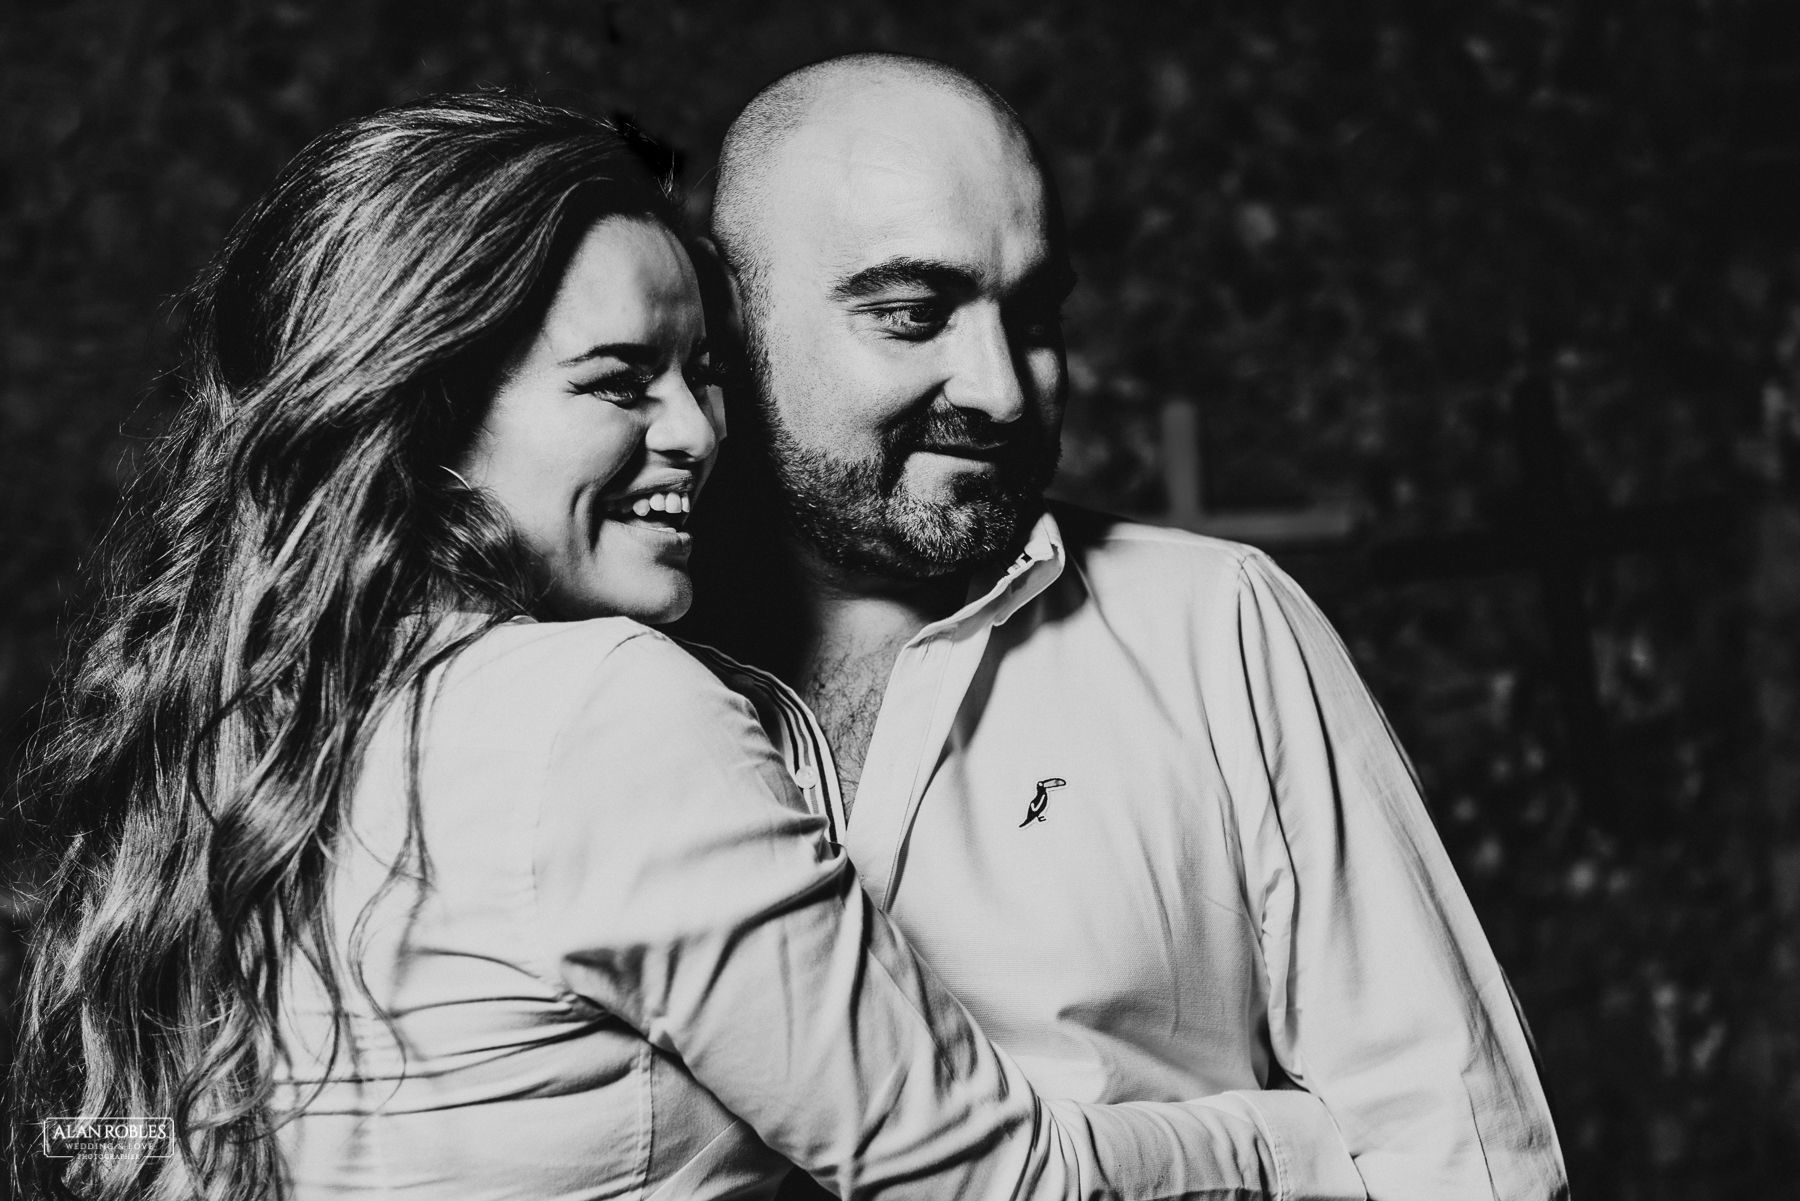 PreBoda KyA Guadalajara-Fotografo de bodas Alan Robles-34